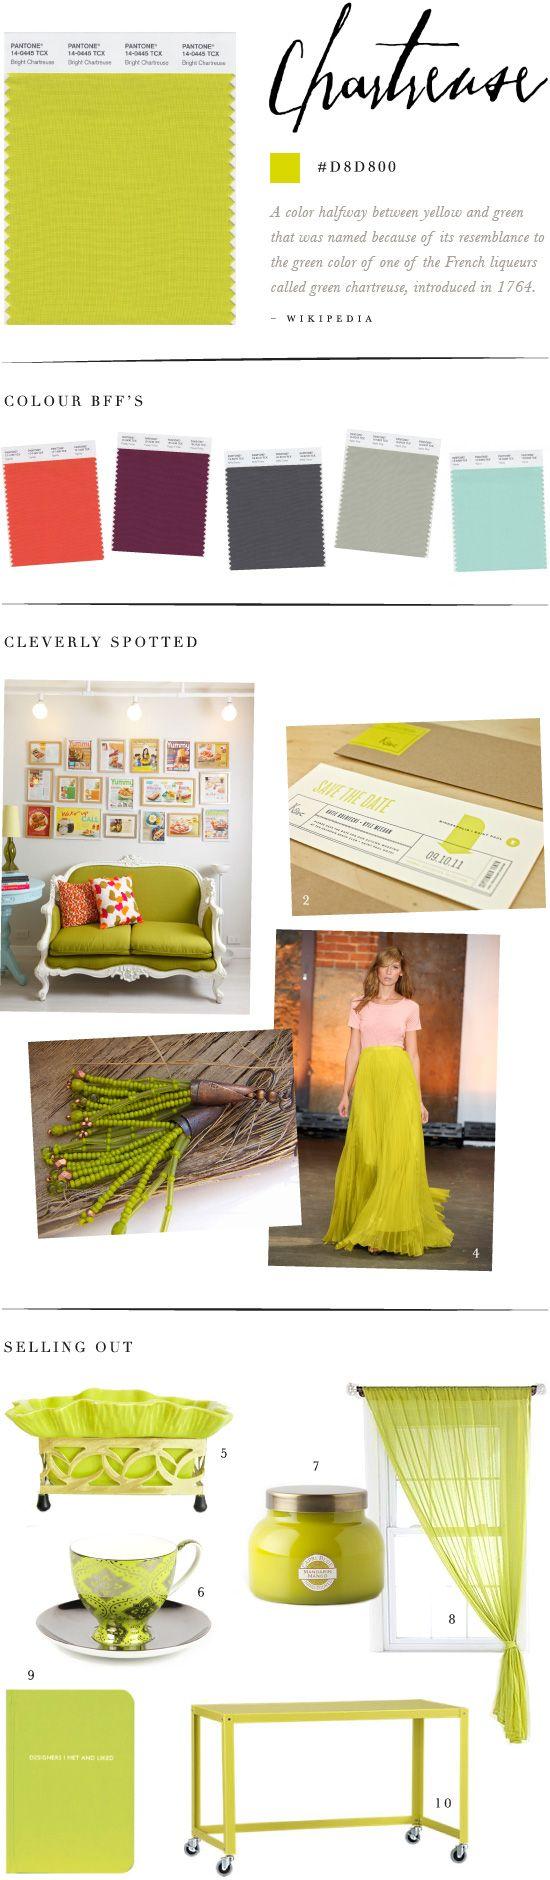 Colour Study: Chartreuse